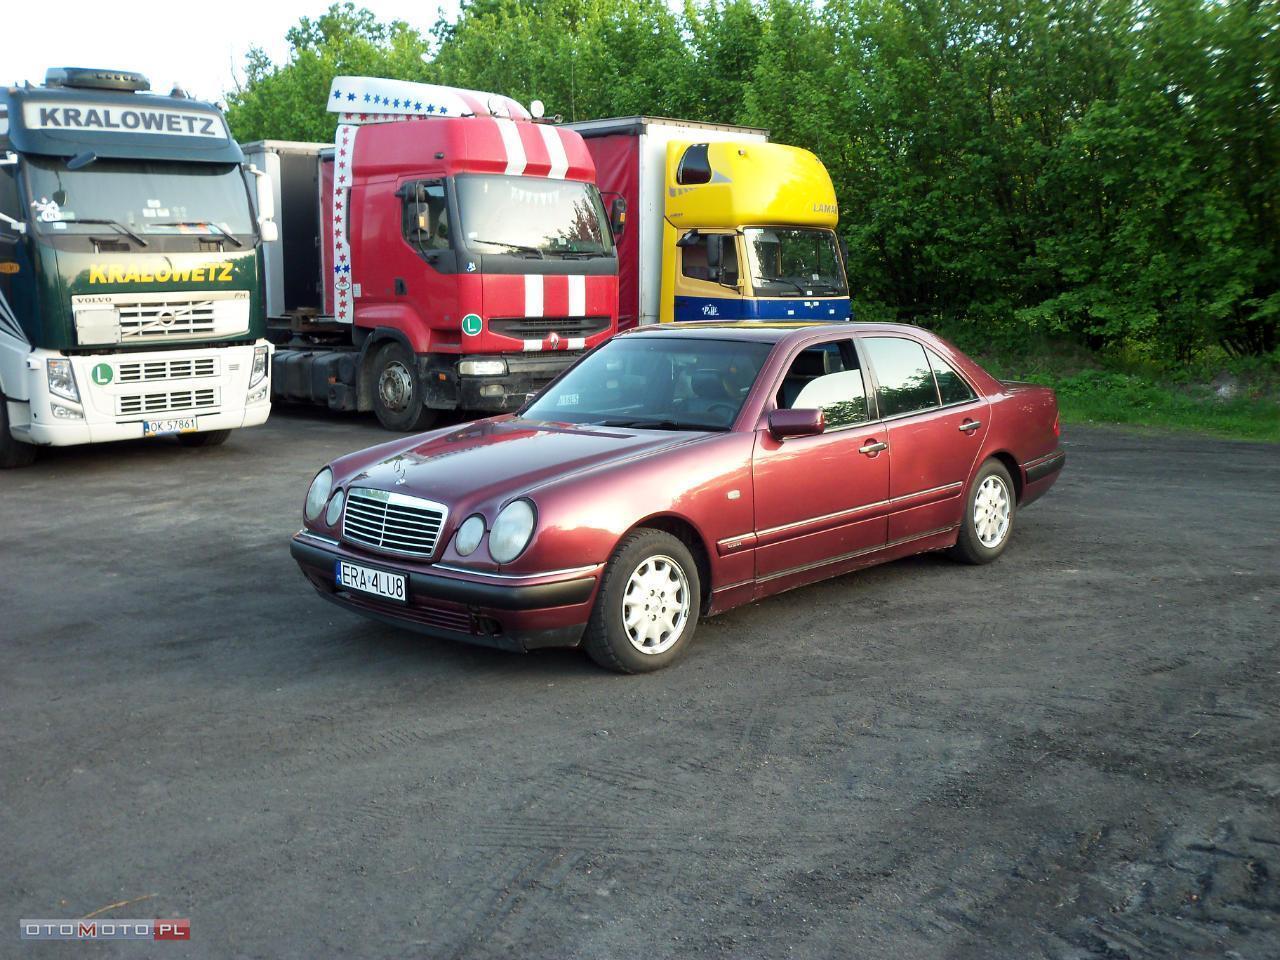 Mercedes-Benz 230 lpg zamiana